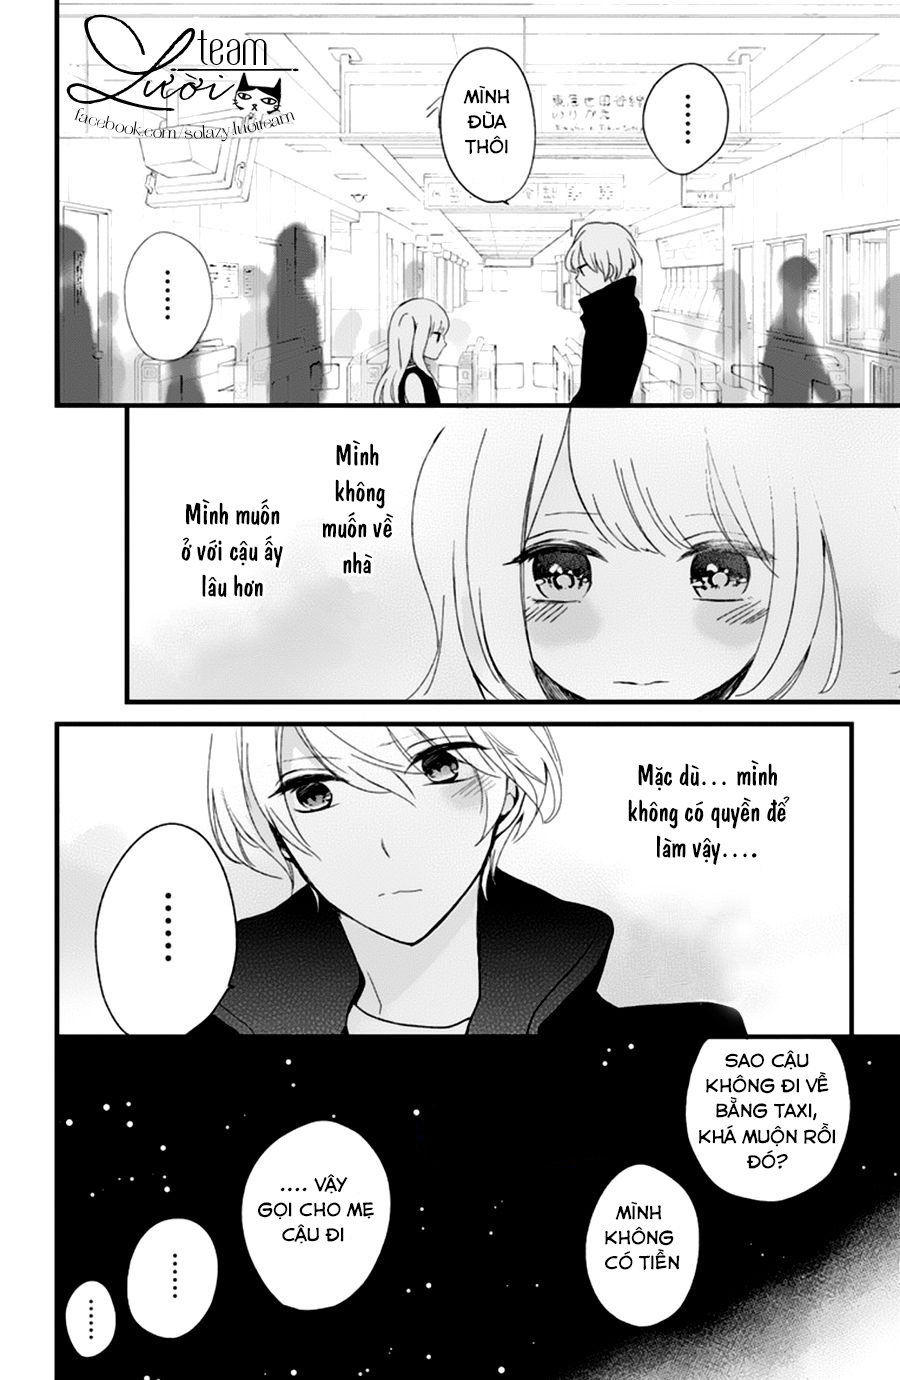 Kimi wa nani mo shiranai - chapter 9